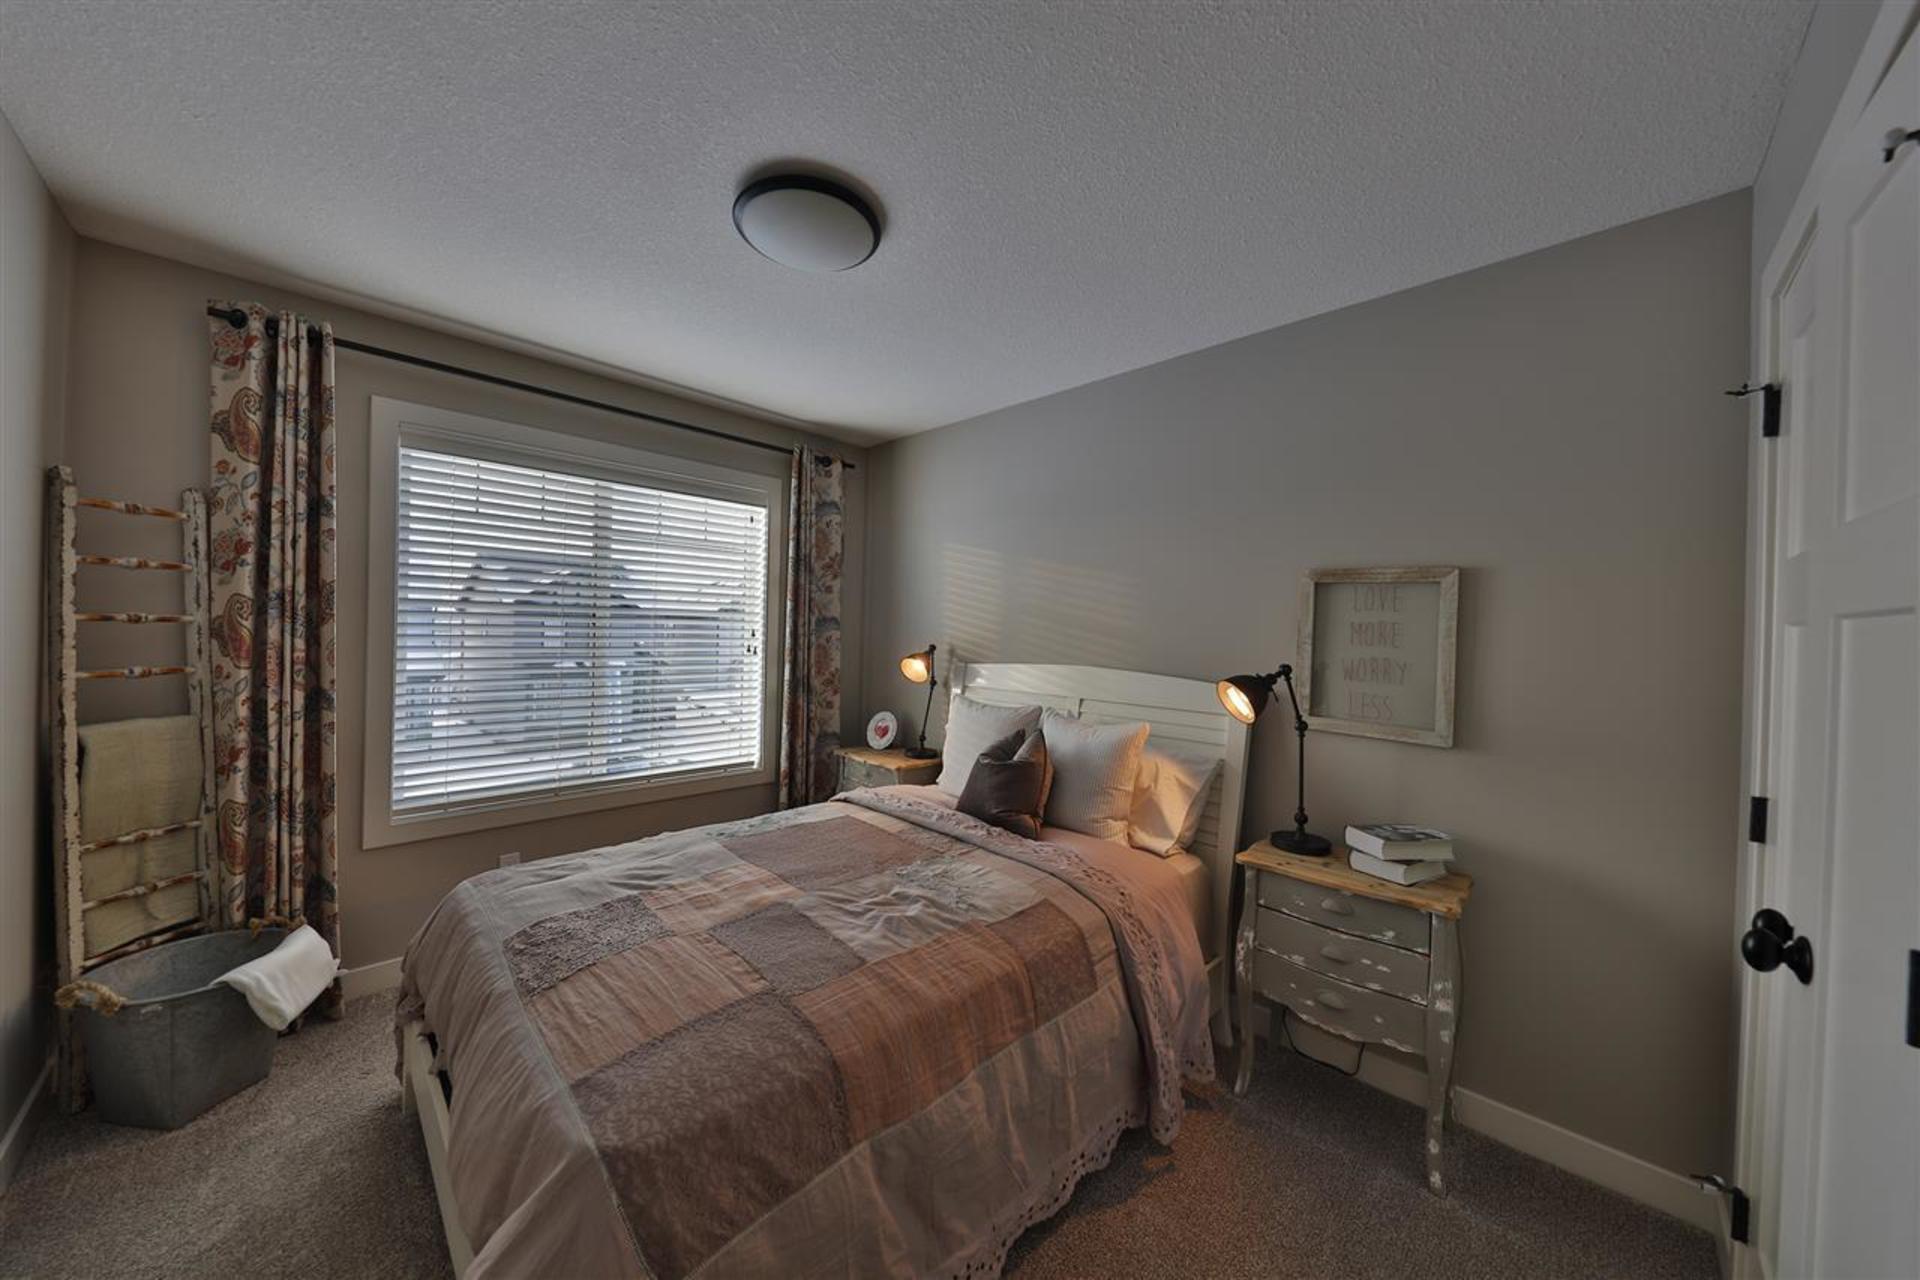 17839-61-street-mcconachie-area-edmonton-21 at 17839 61 Street, McConachie Area, Edmonton